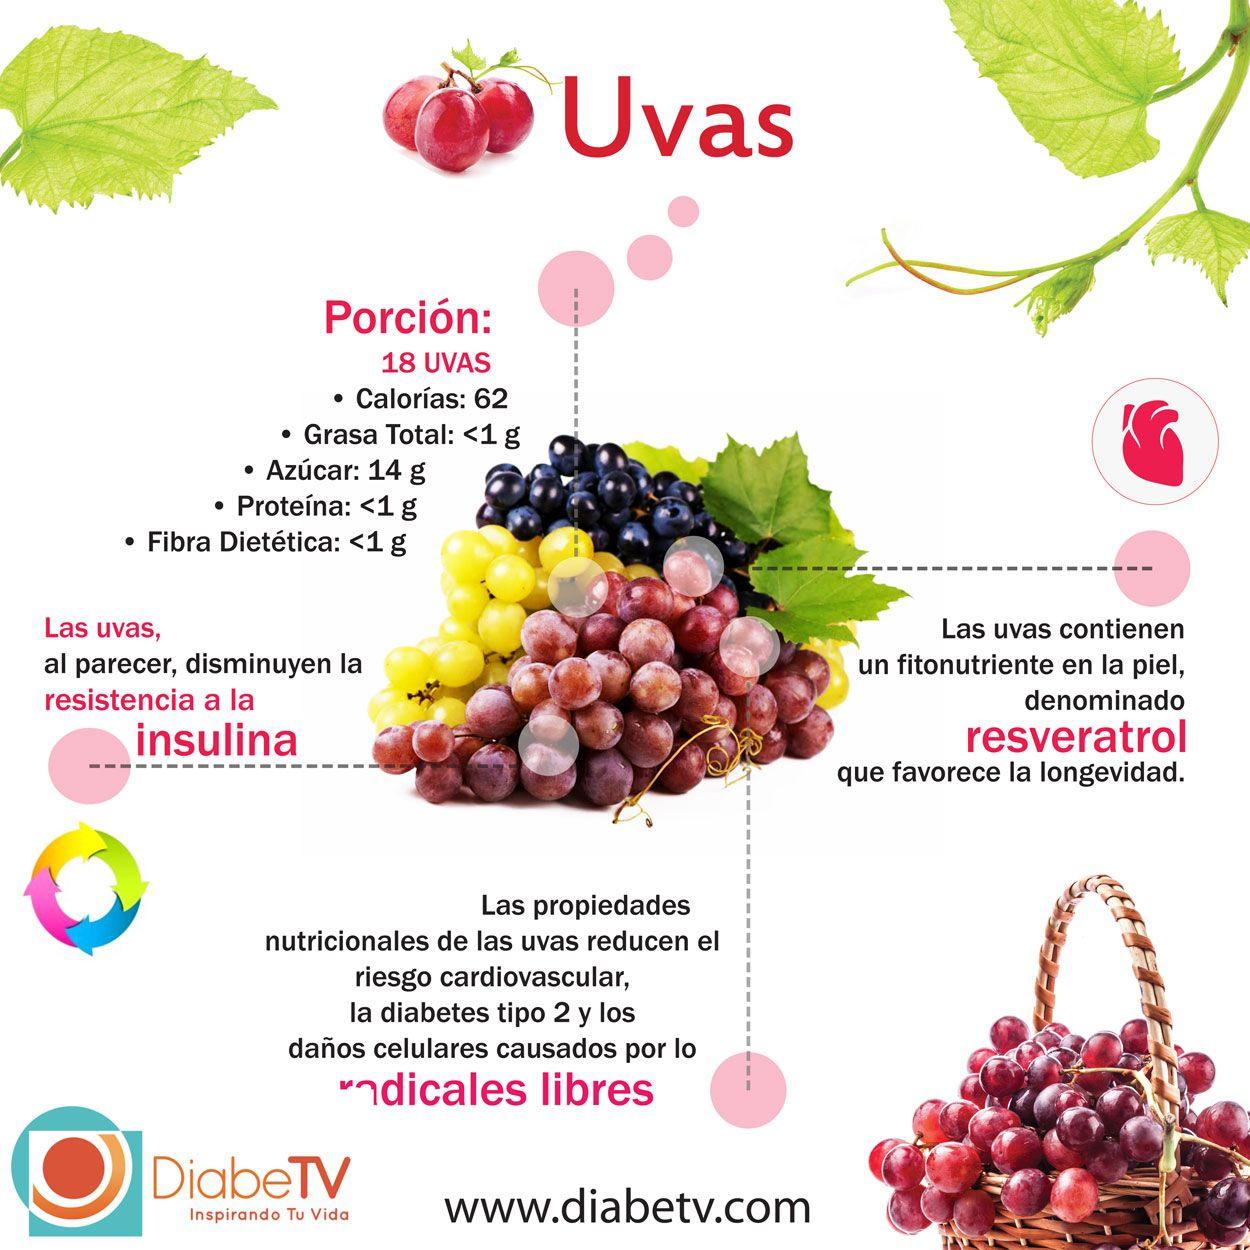 dietetica de la diabetes